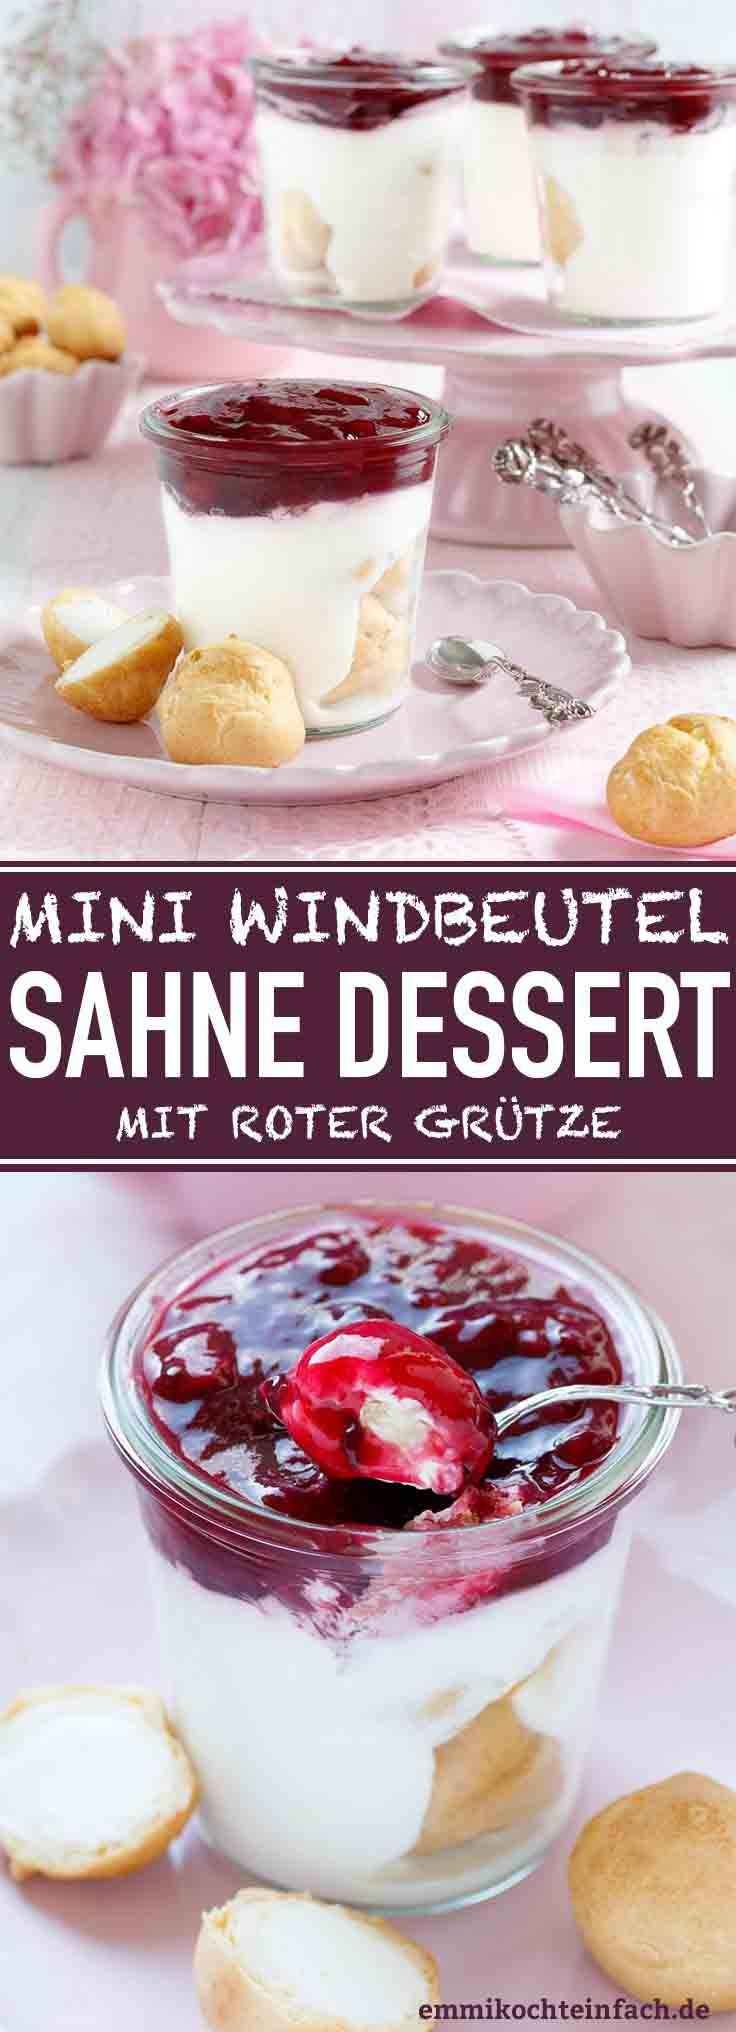 Sobremesa de creme folhado com geléia de frutas vermelhas   – emmikochteinfach – Der Food-Blog mit einfachen Rezepten, die gelingen